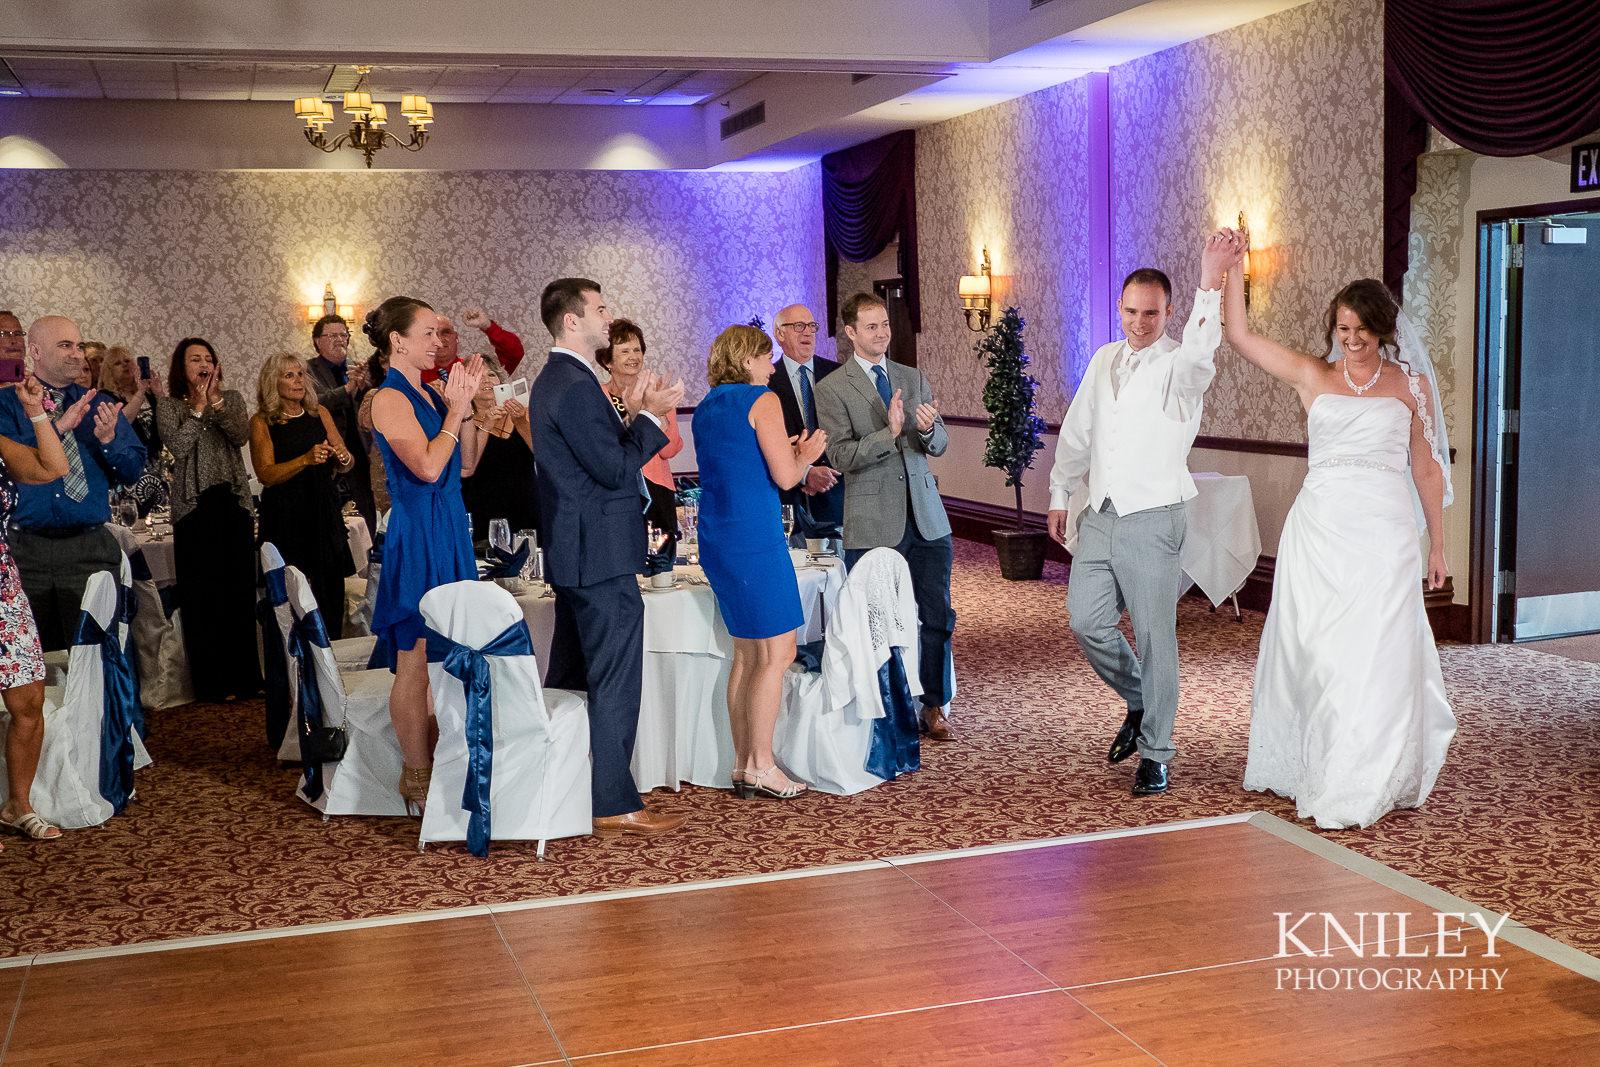 094 - Rochester Riverside Convention Center Wedding Photo - Rocheser NY - XT2A0974.jpg